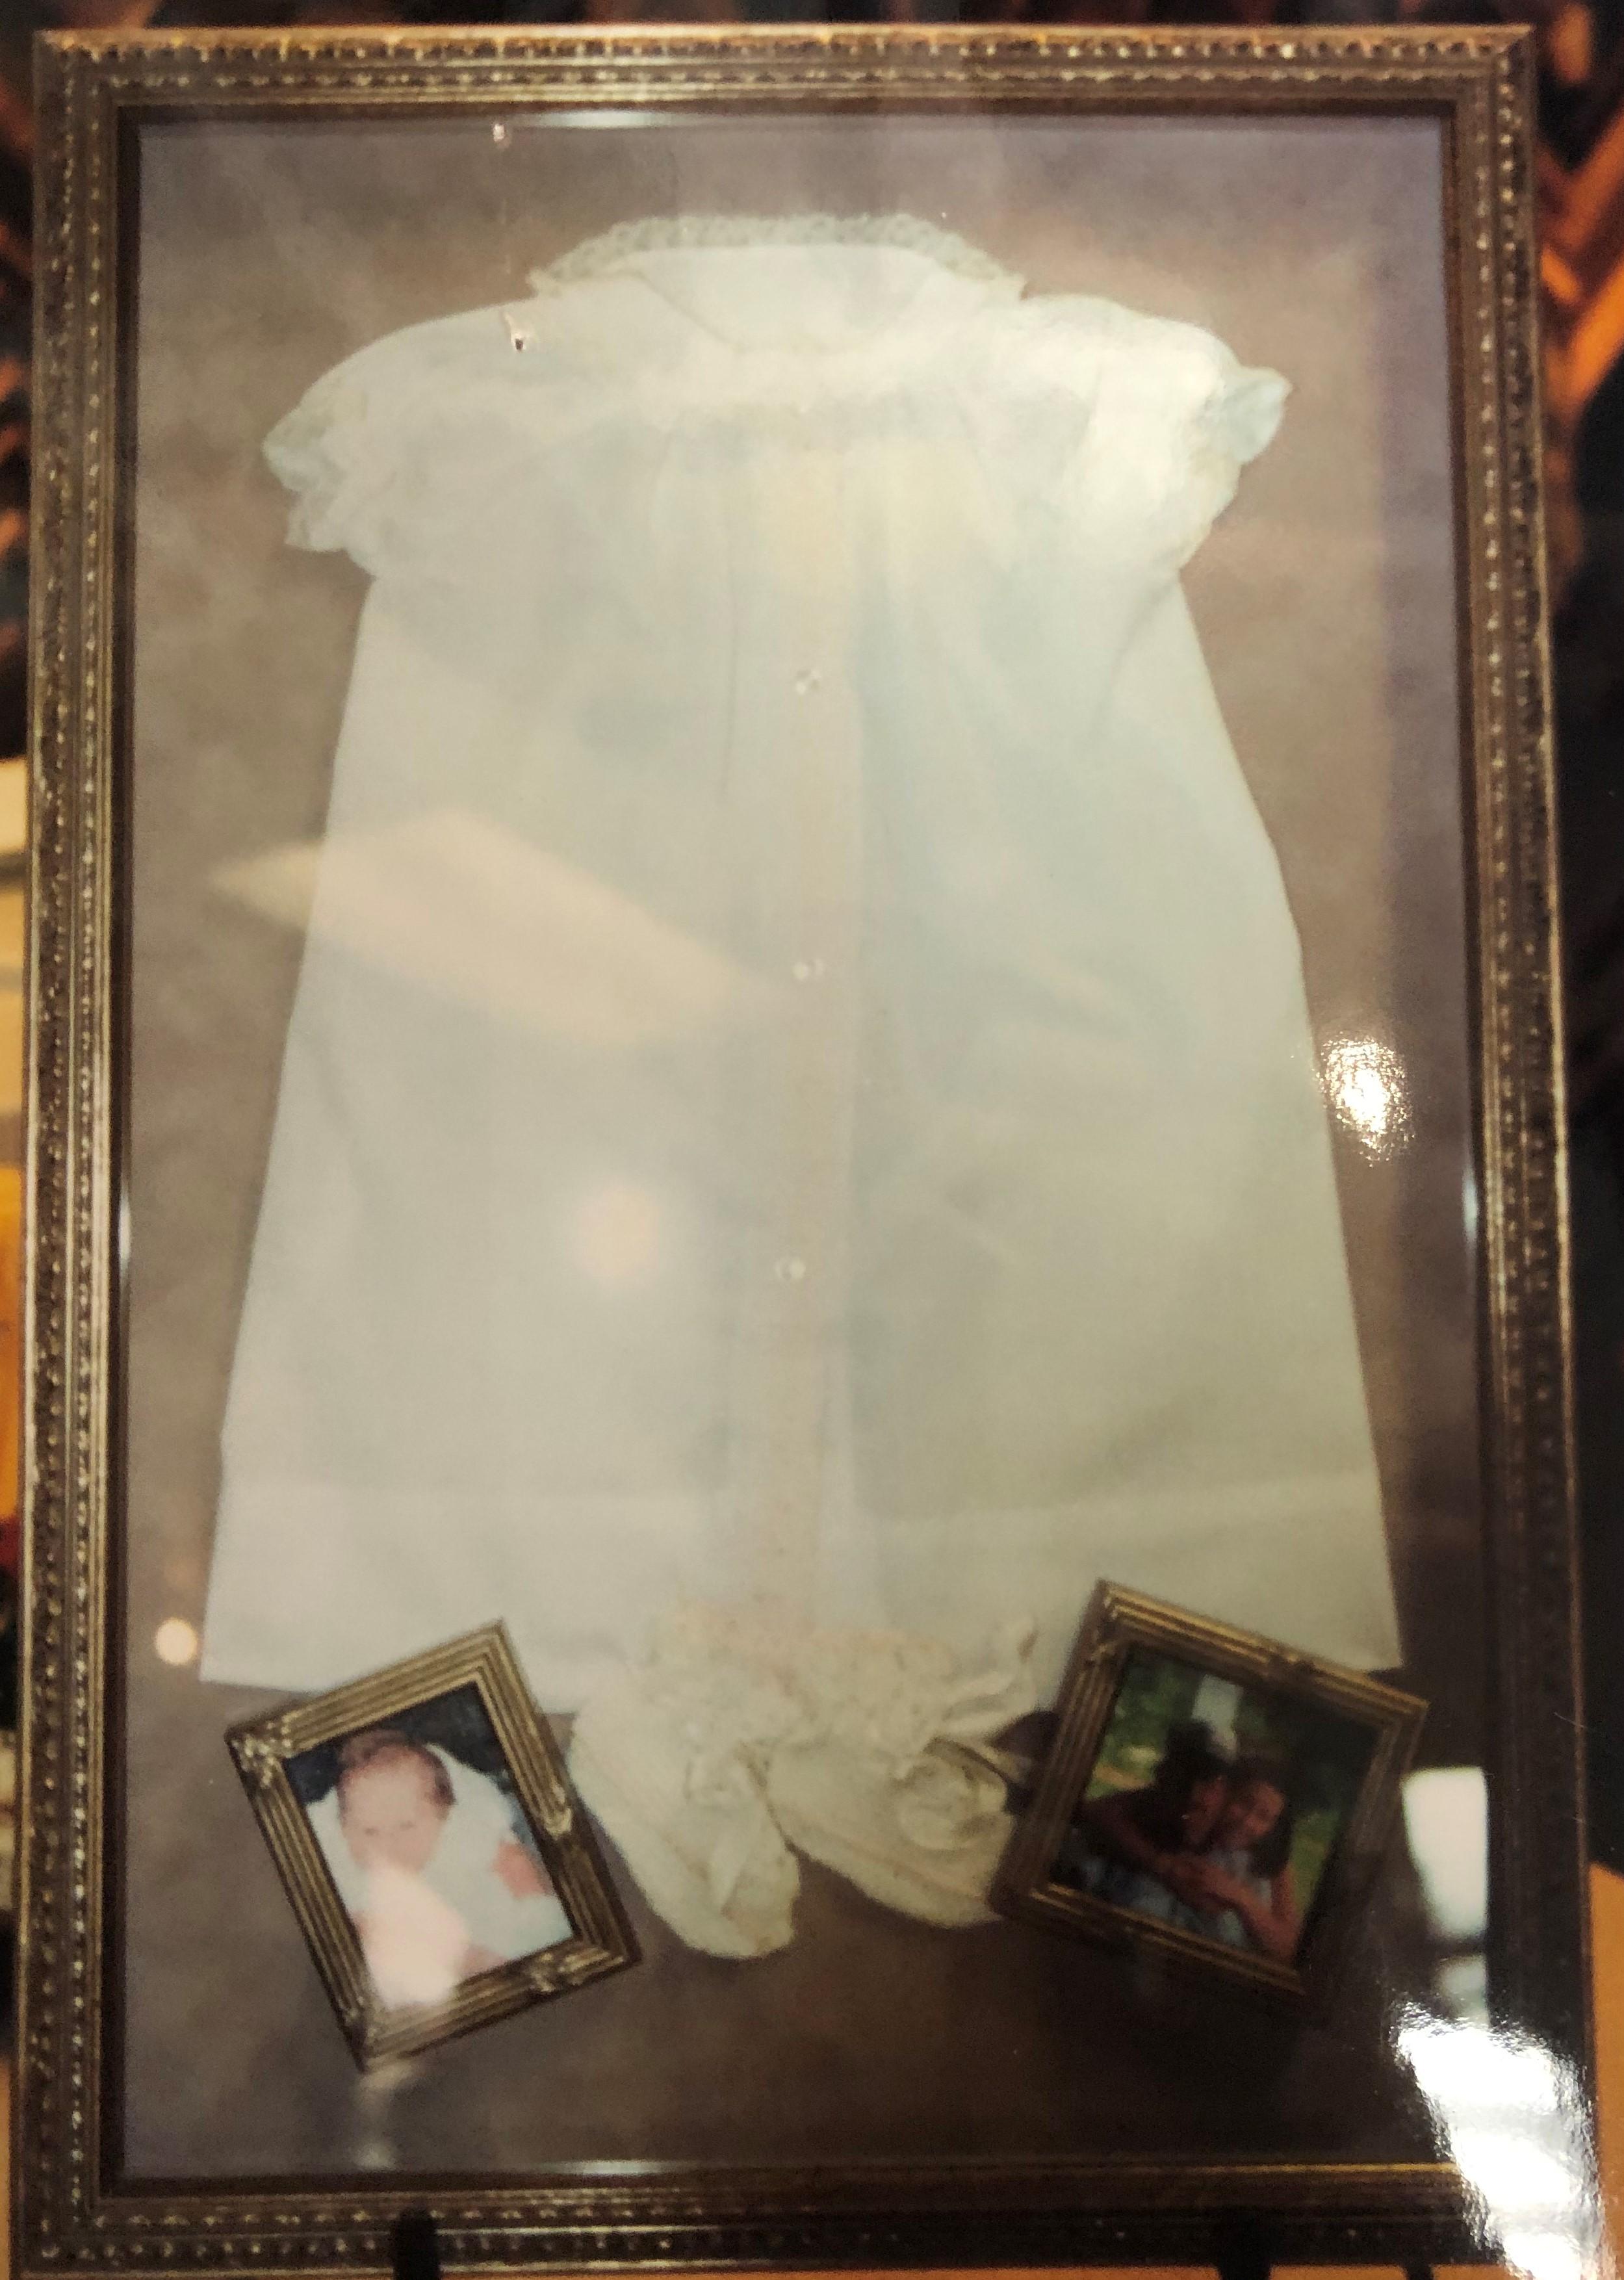 4-christening-gown.jpg